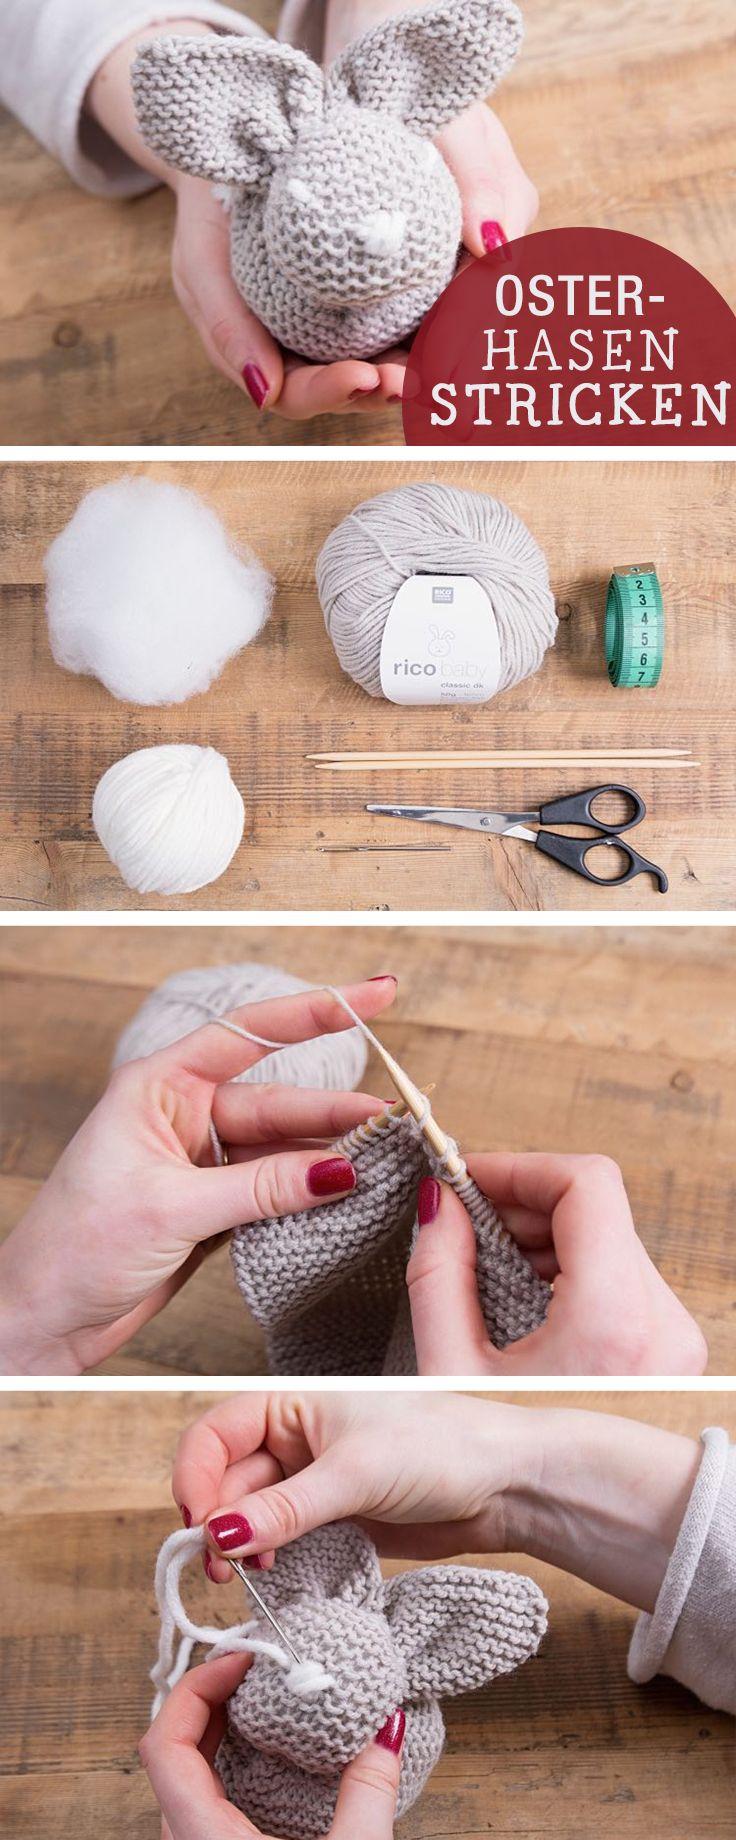 DIY-Anleitung: Osterhase stricken, Osterdeko / diy tutorial: how to knit an easter bunny via DaWanda.com